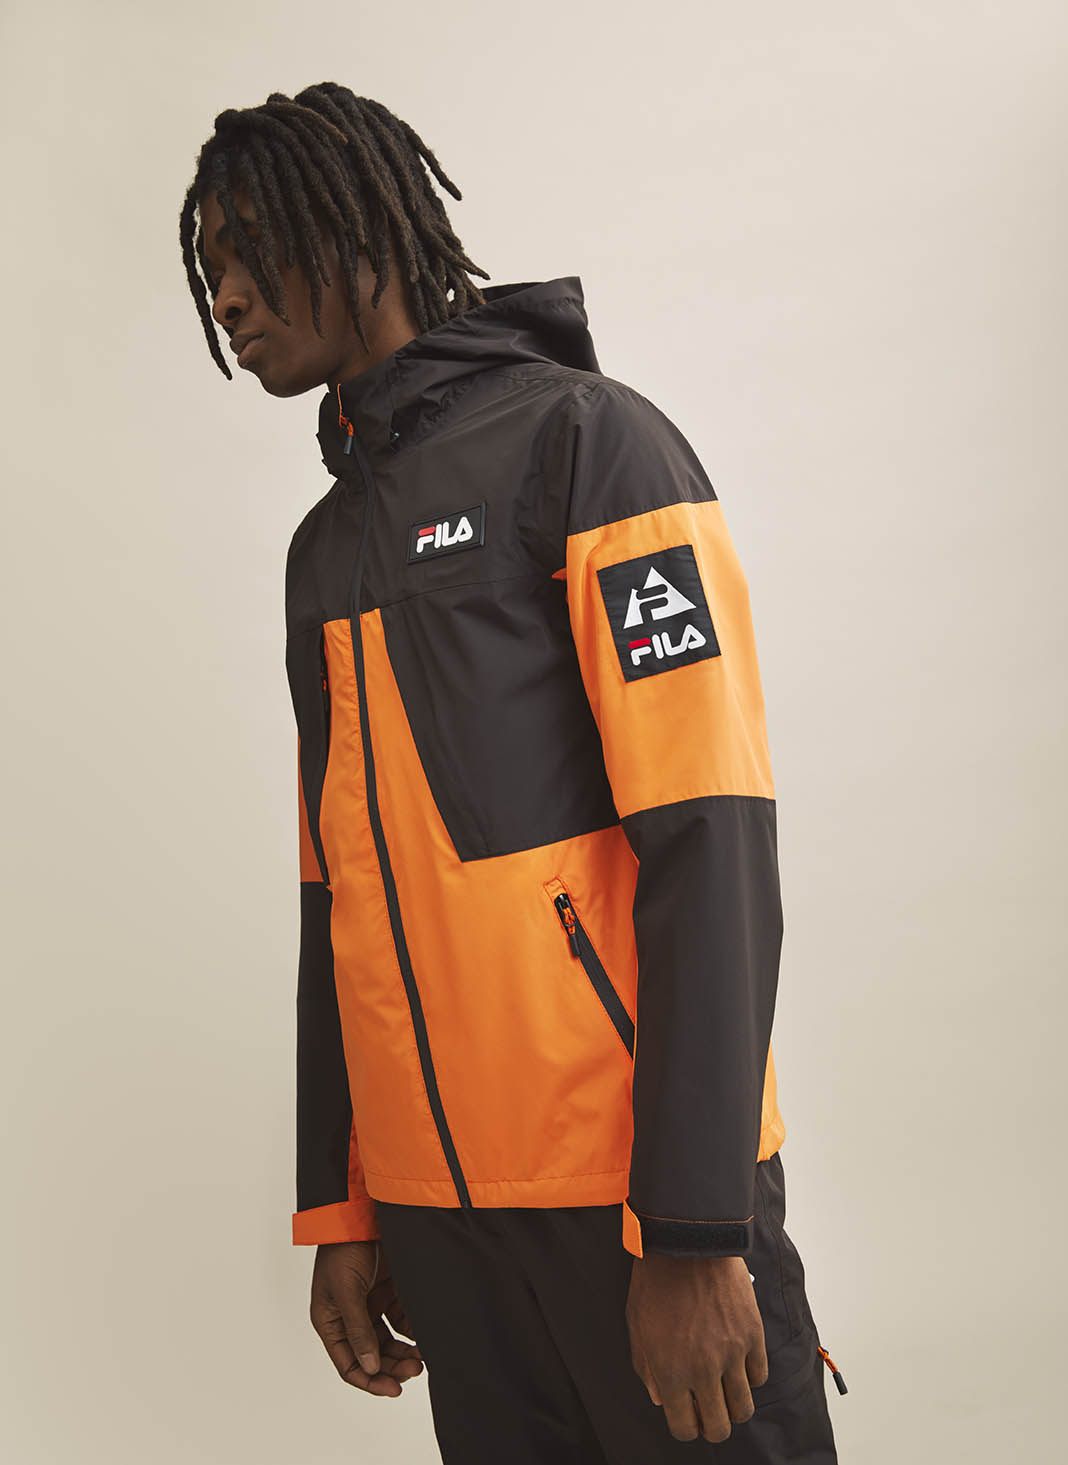 FILA yellow black jacket